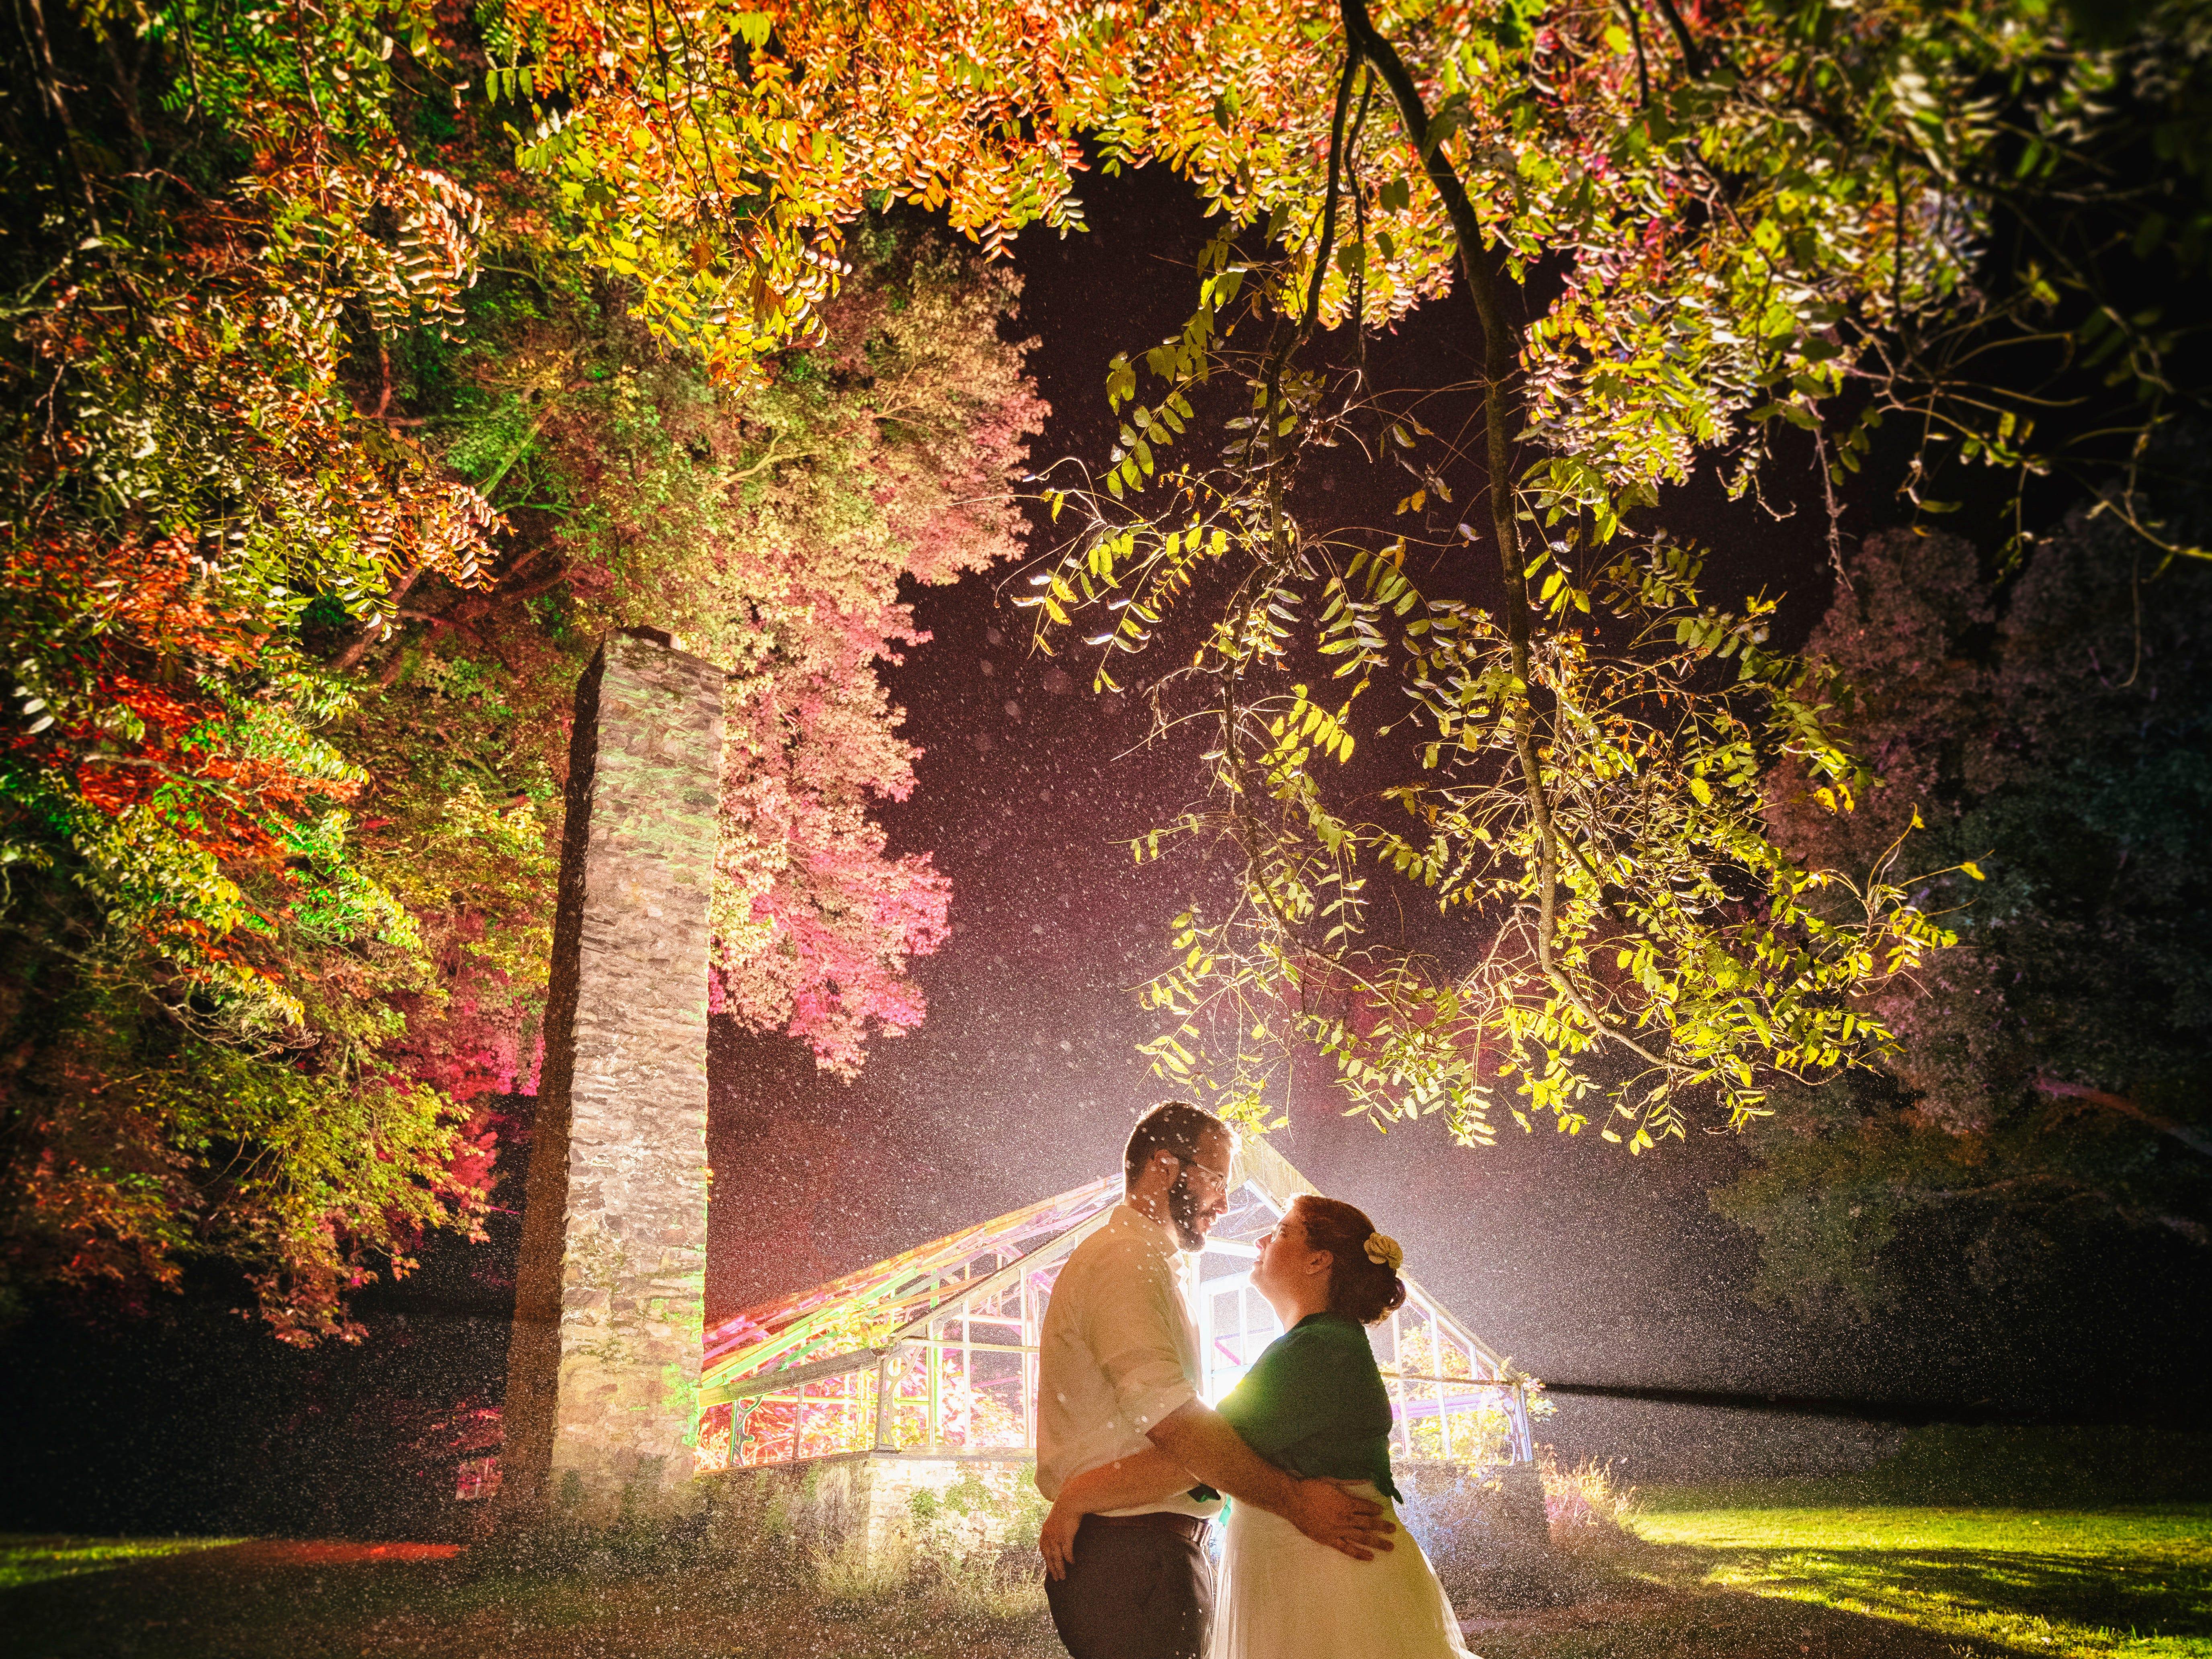 The wedding of Jody and Jon Zalocha at Philander Chase Knot Estate in Malvern, Pennsylvania.